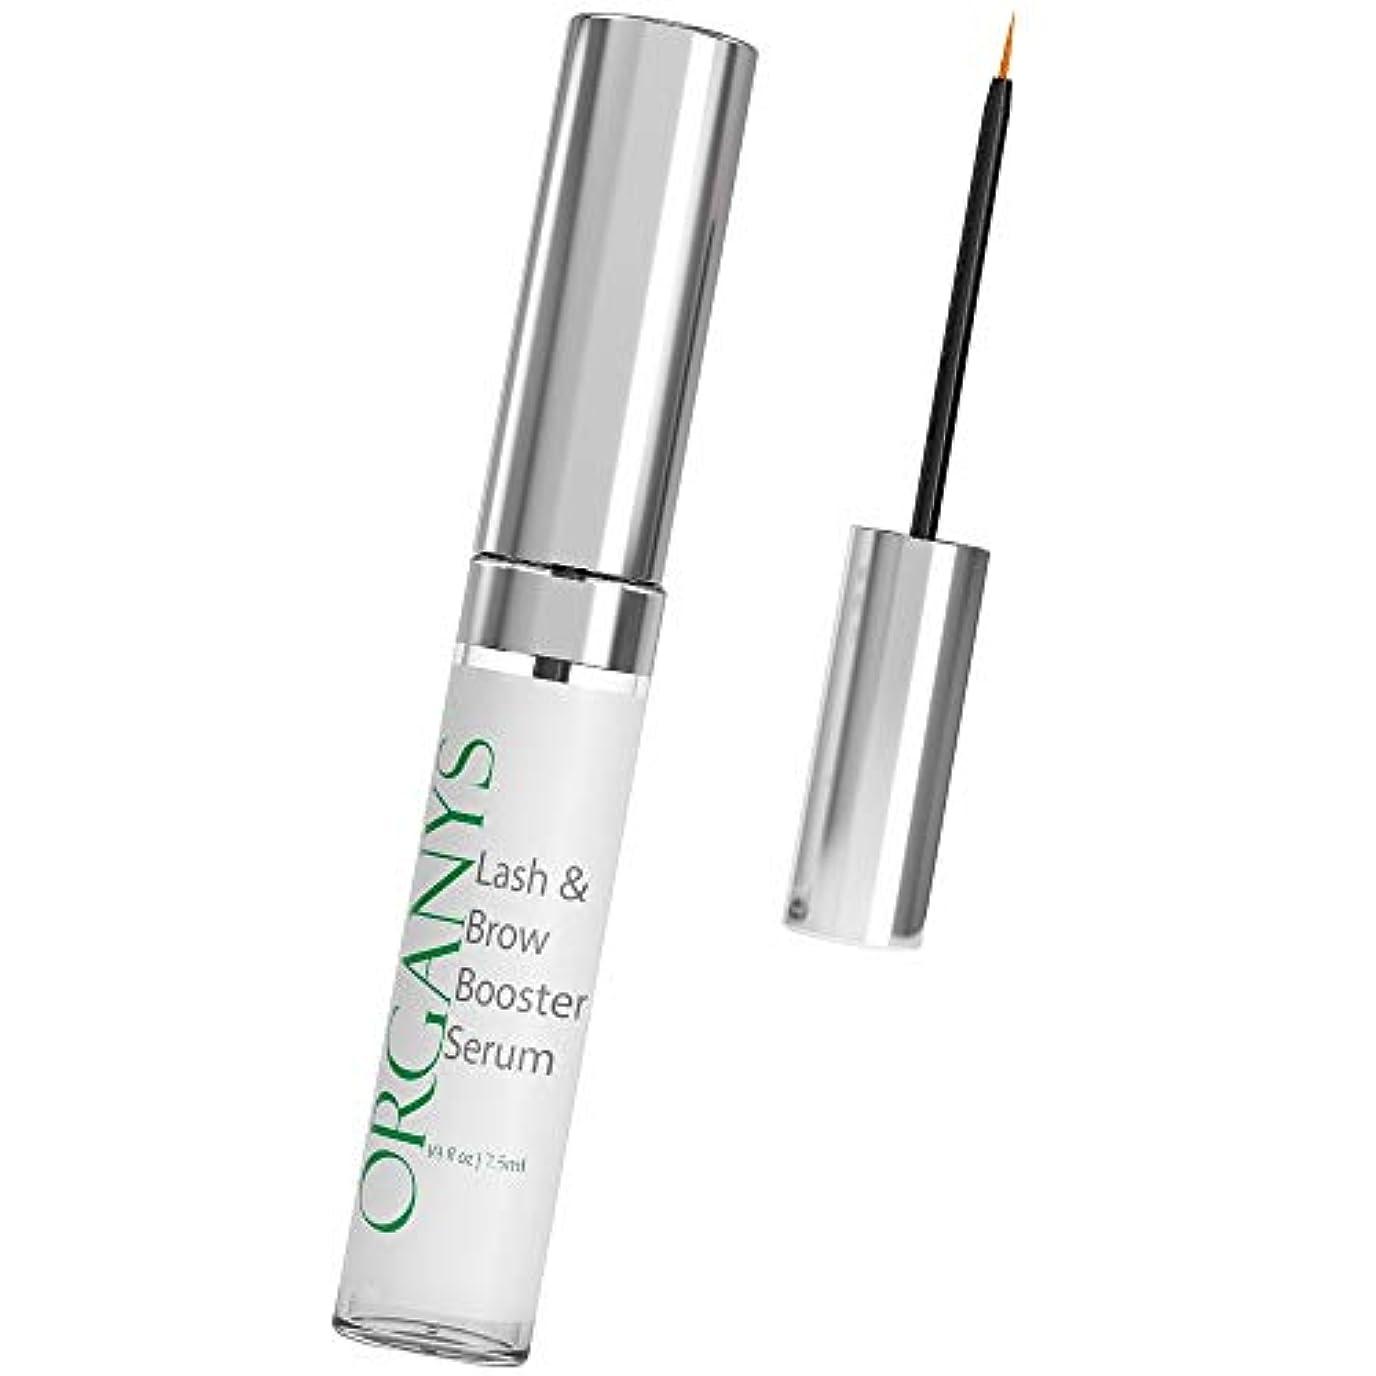 Organyc Eyelash & Eyebrow Growth Serum (High Potency) Grows Longer, Fuller, Thicker Lashes & Brows in 60 days!...